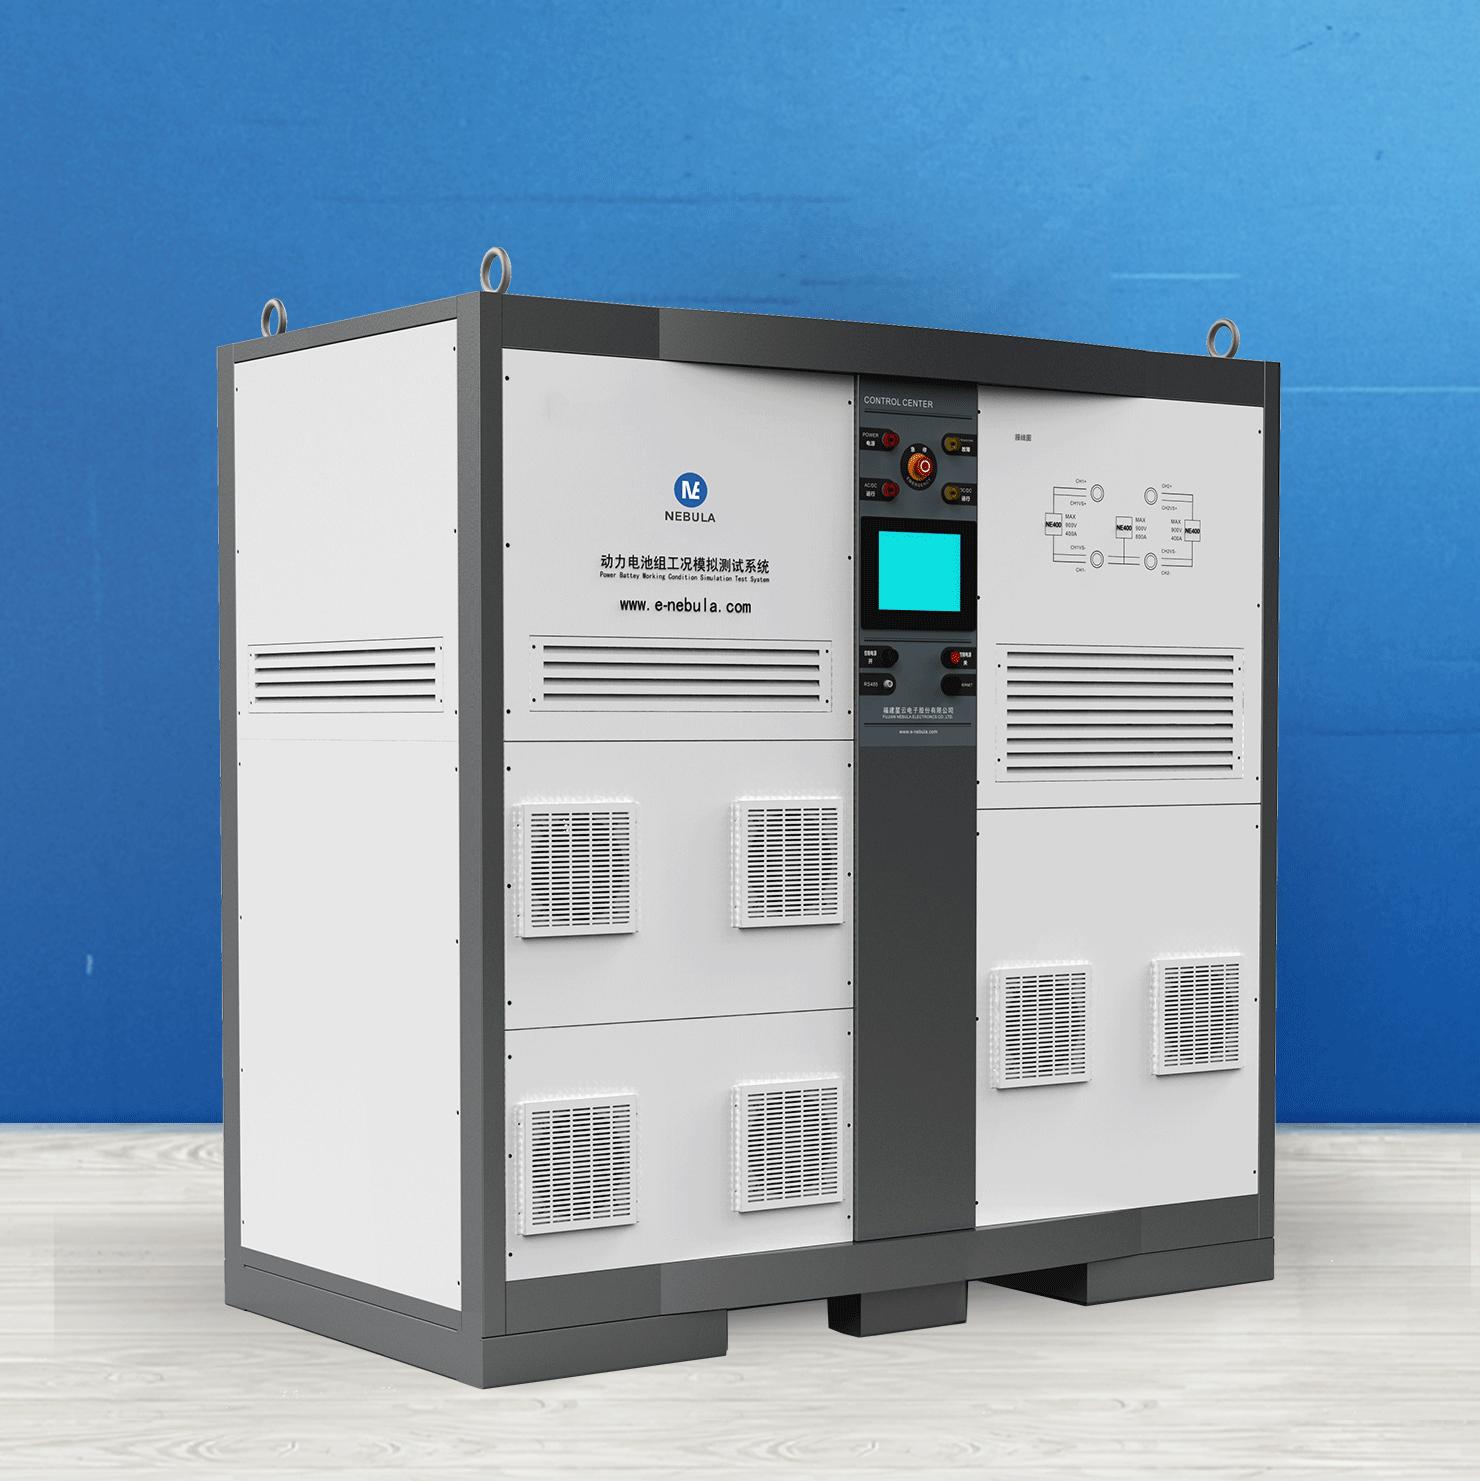 充放电测试系统1000V系列 Featured Image